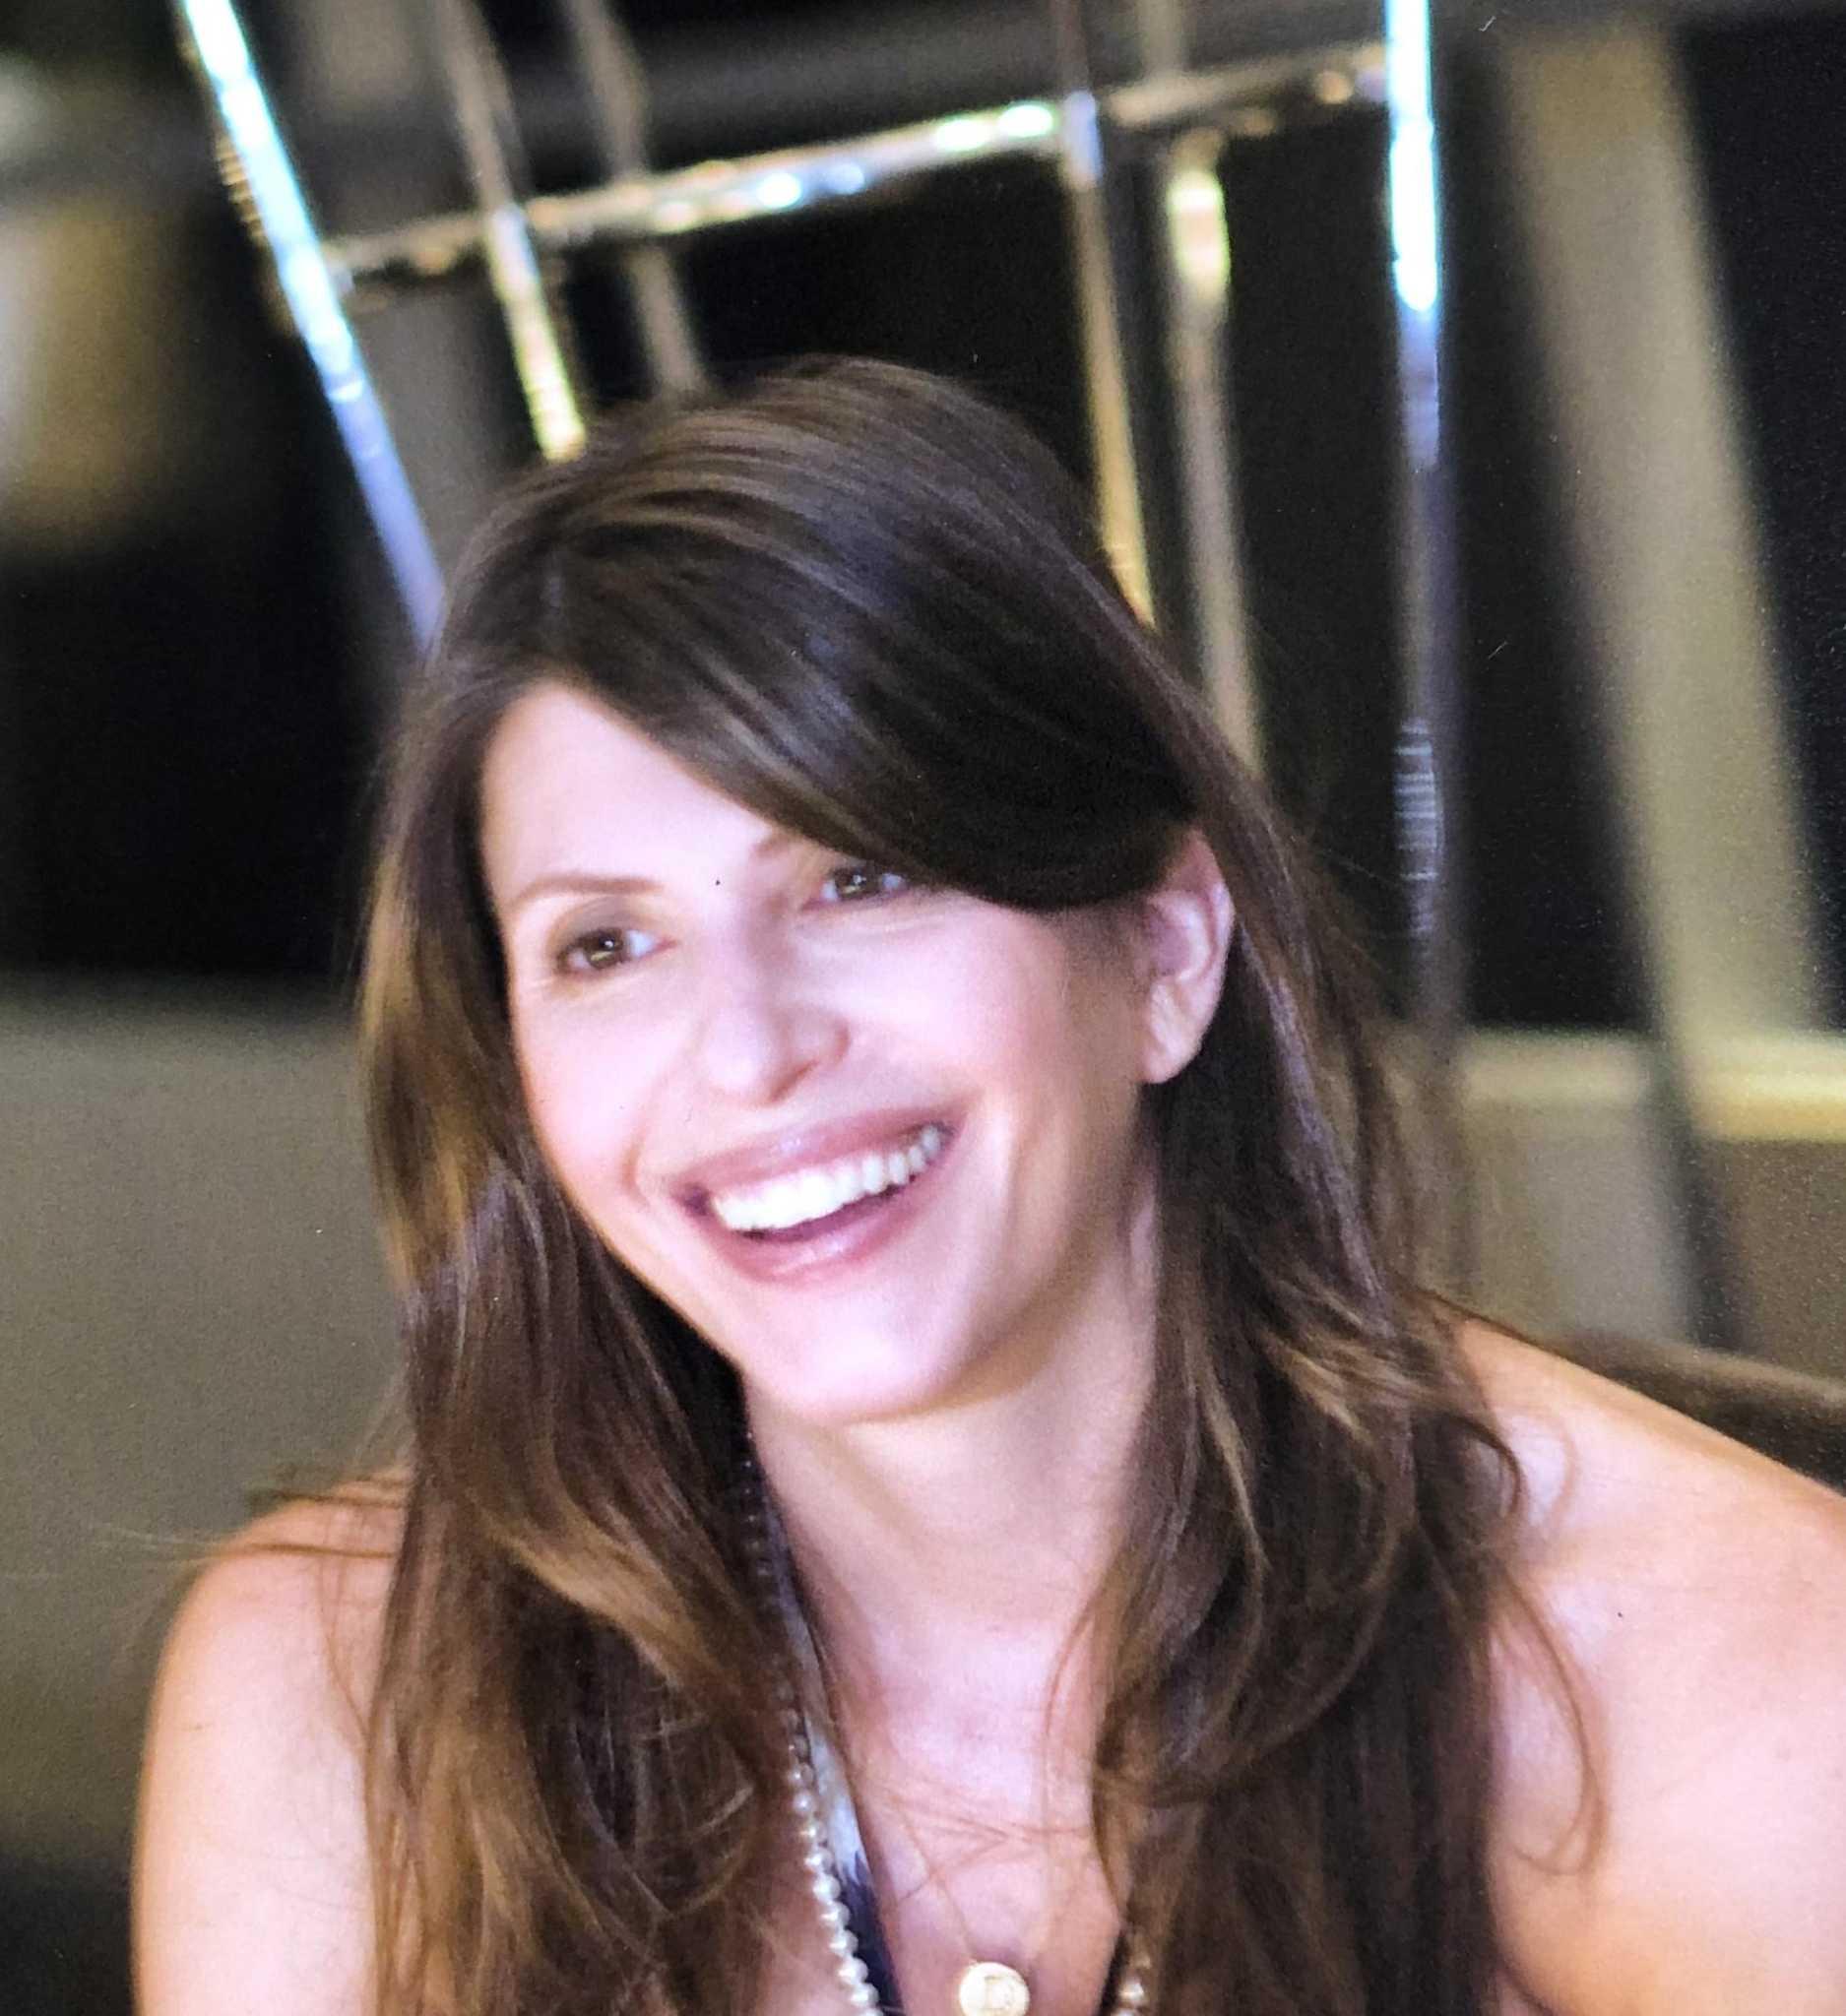 Warrants: Years of fear ended in Jennifer Dulos' homicide - CTInsider.com